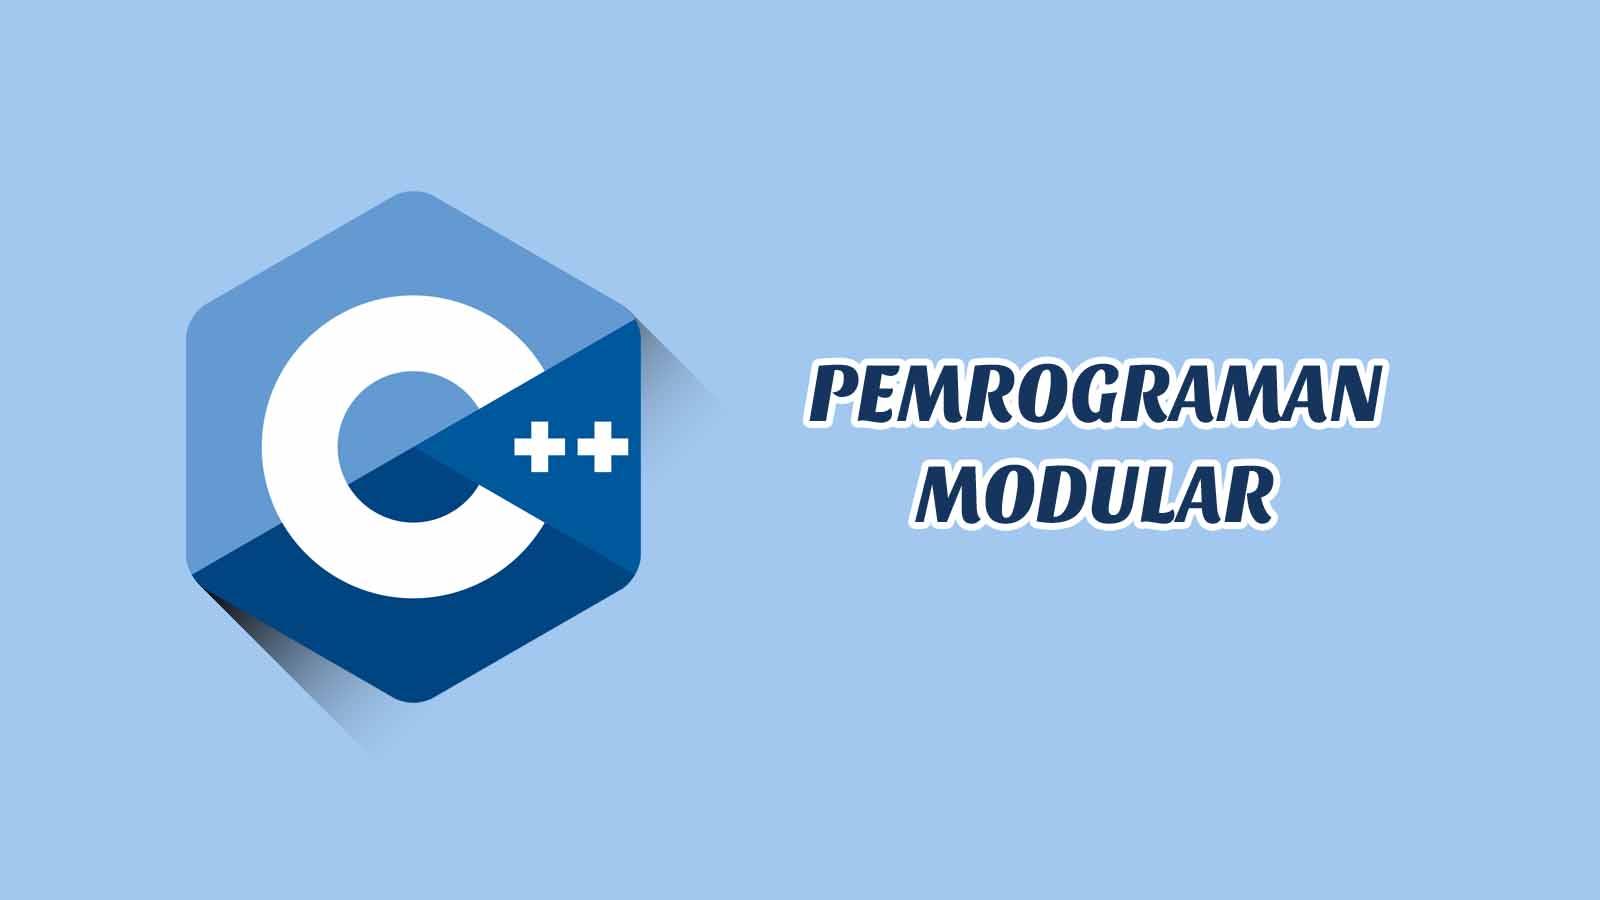 Pemrograman Modular C++ Disertai Contoh, Tugas dan Jawaban